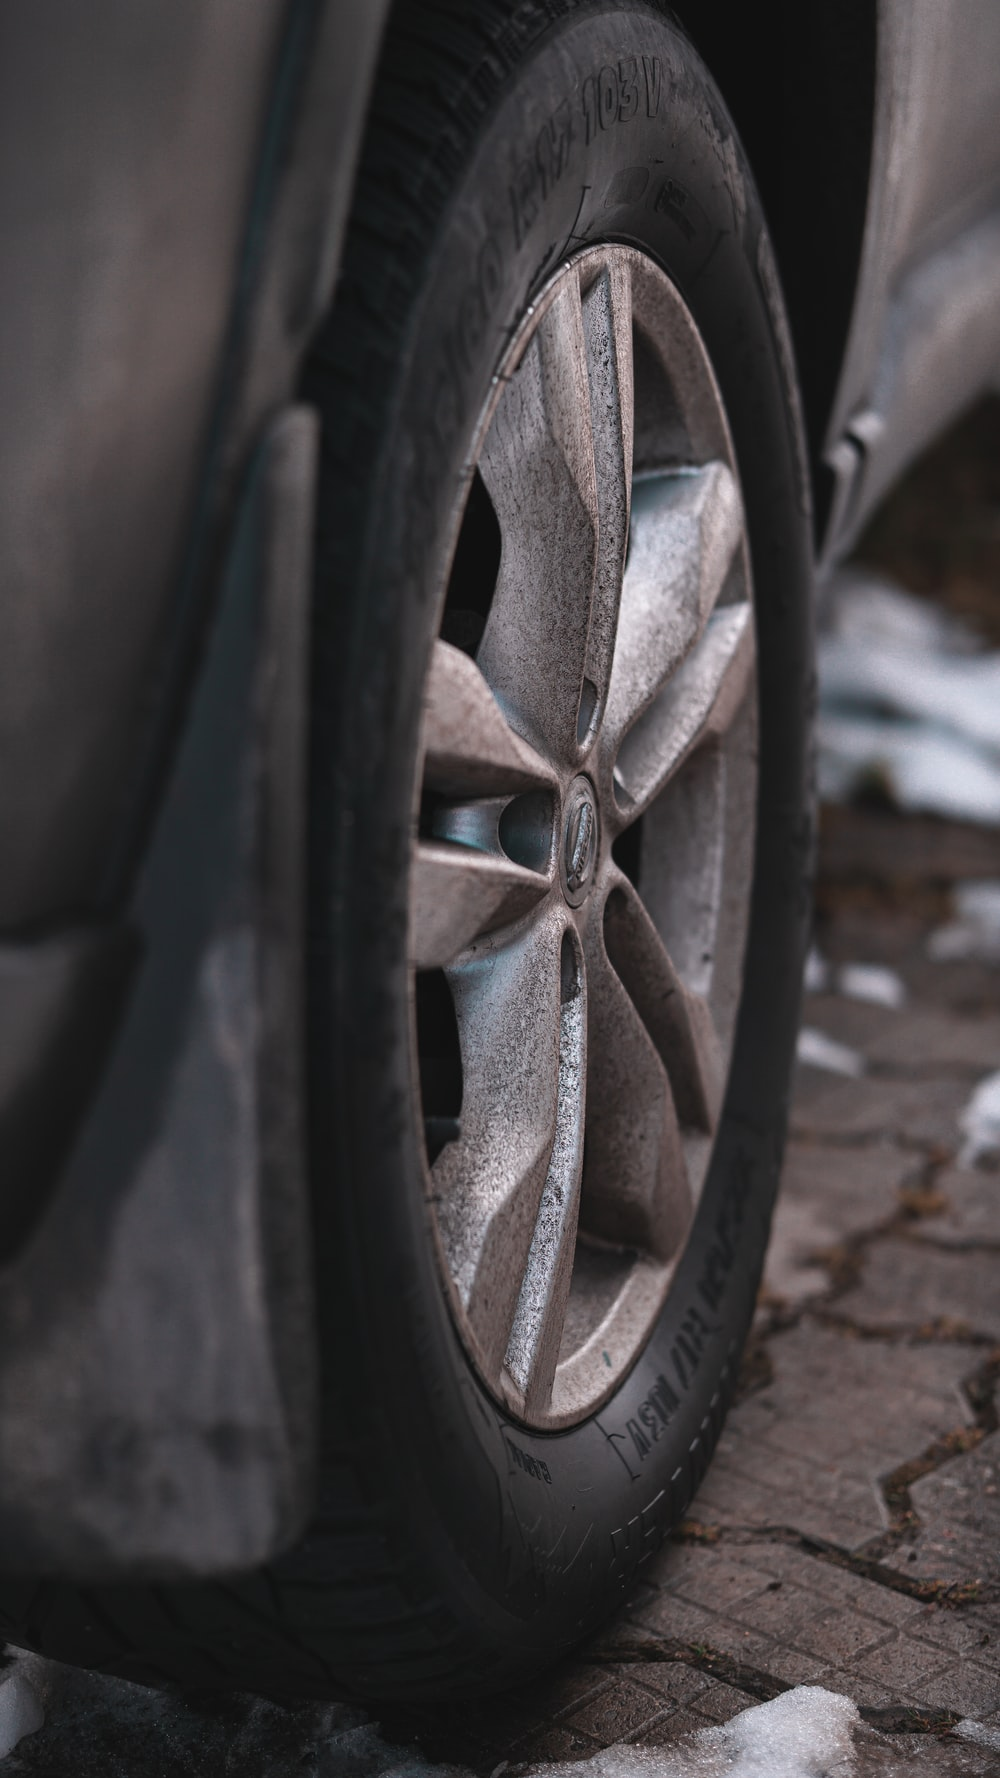 black car wheel on brown concrete floor